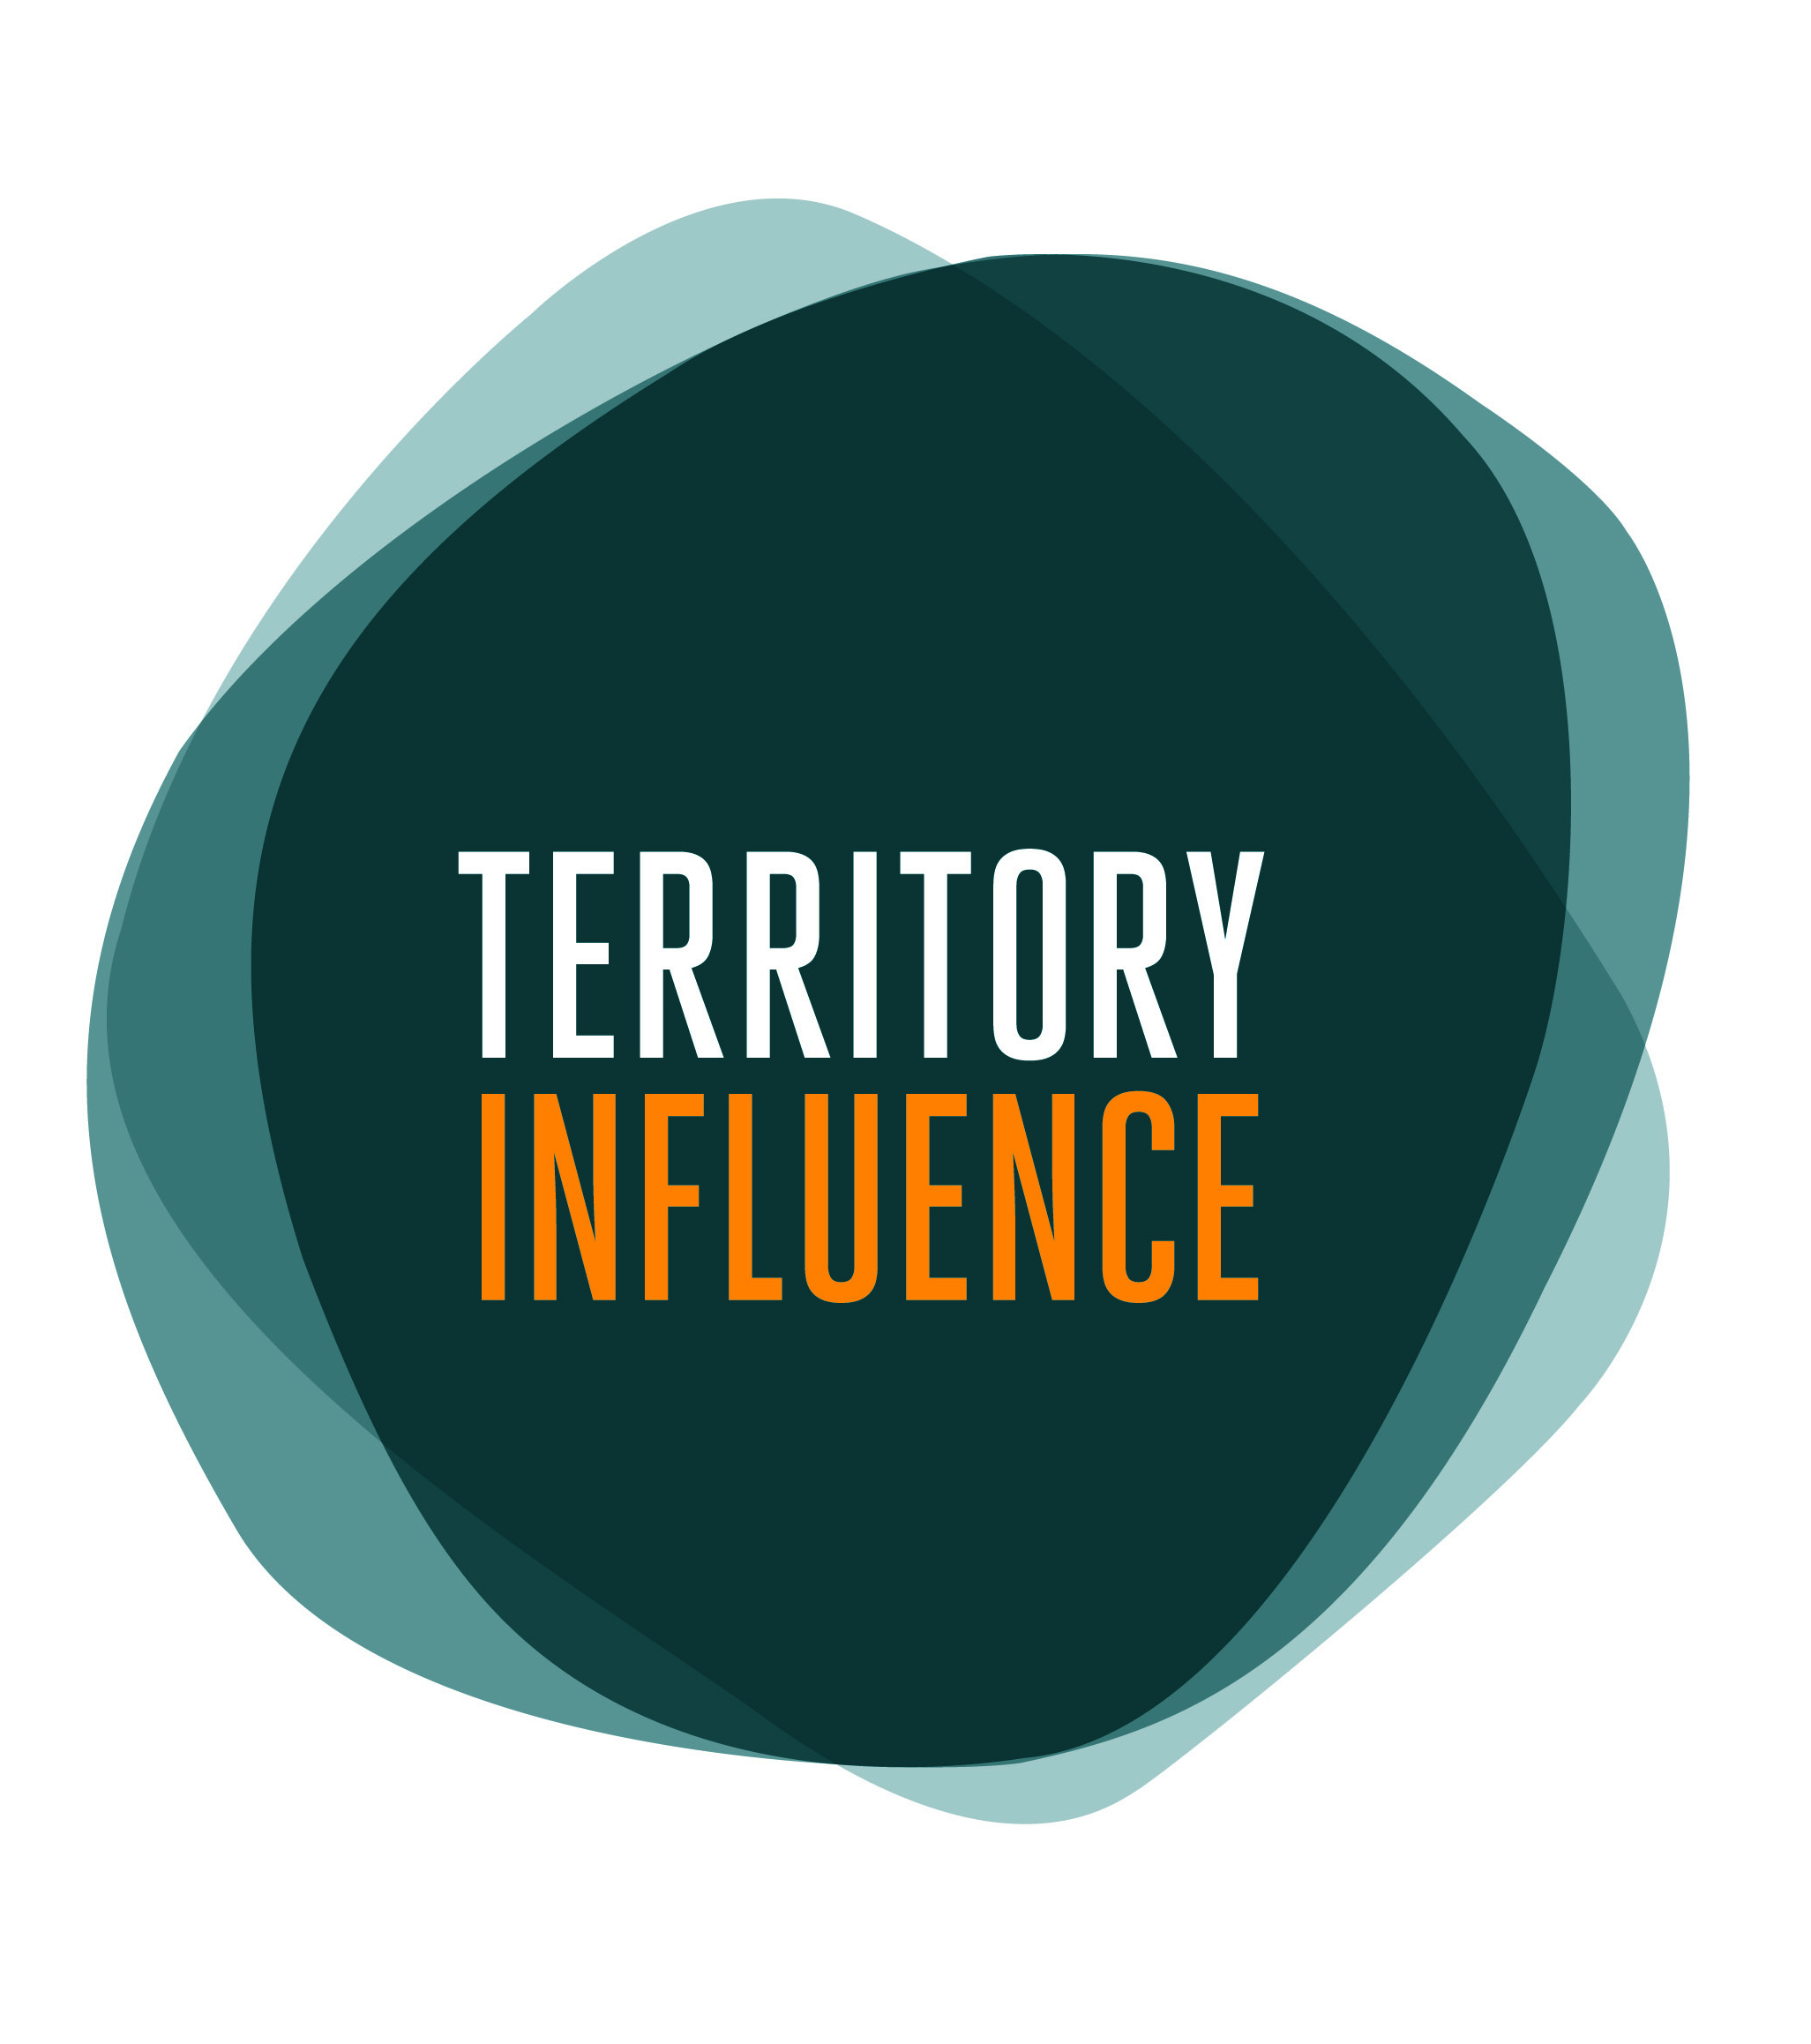 Territory Influence startet europaweite Expansion